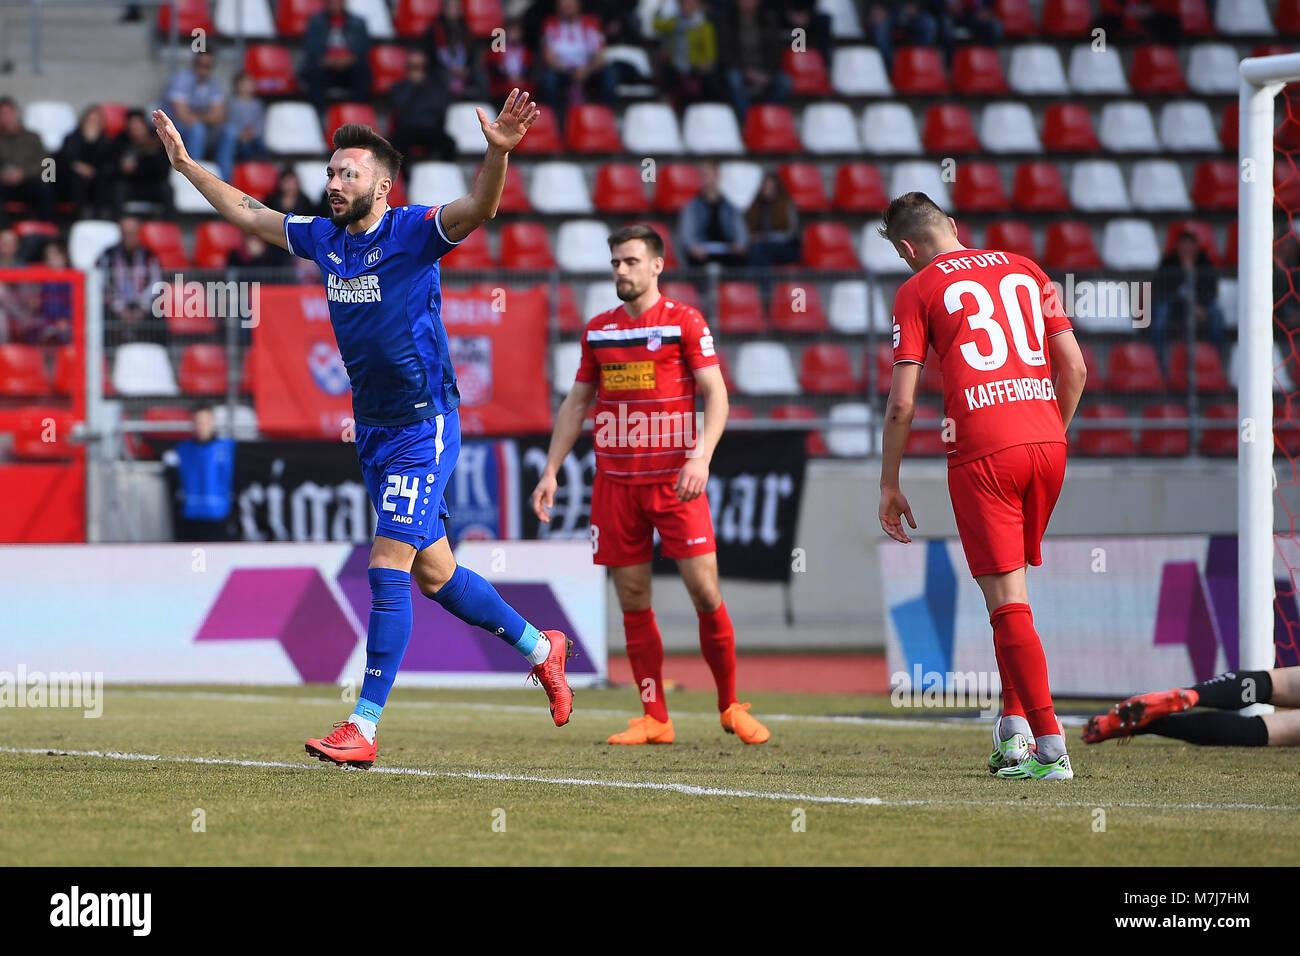 jubilation ueber das goal zum 0:1: goalschutze Fabian Schleusener (KSC, l.).  GES/ Fussball/ 3. Liga: RW Erfurt - Stock Image